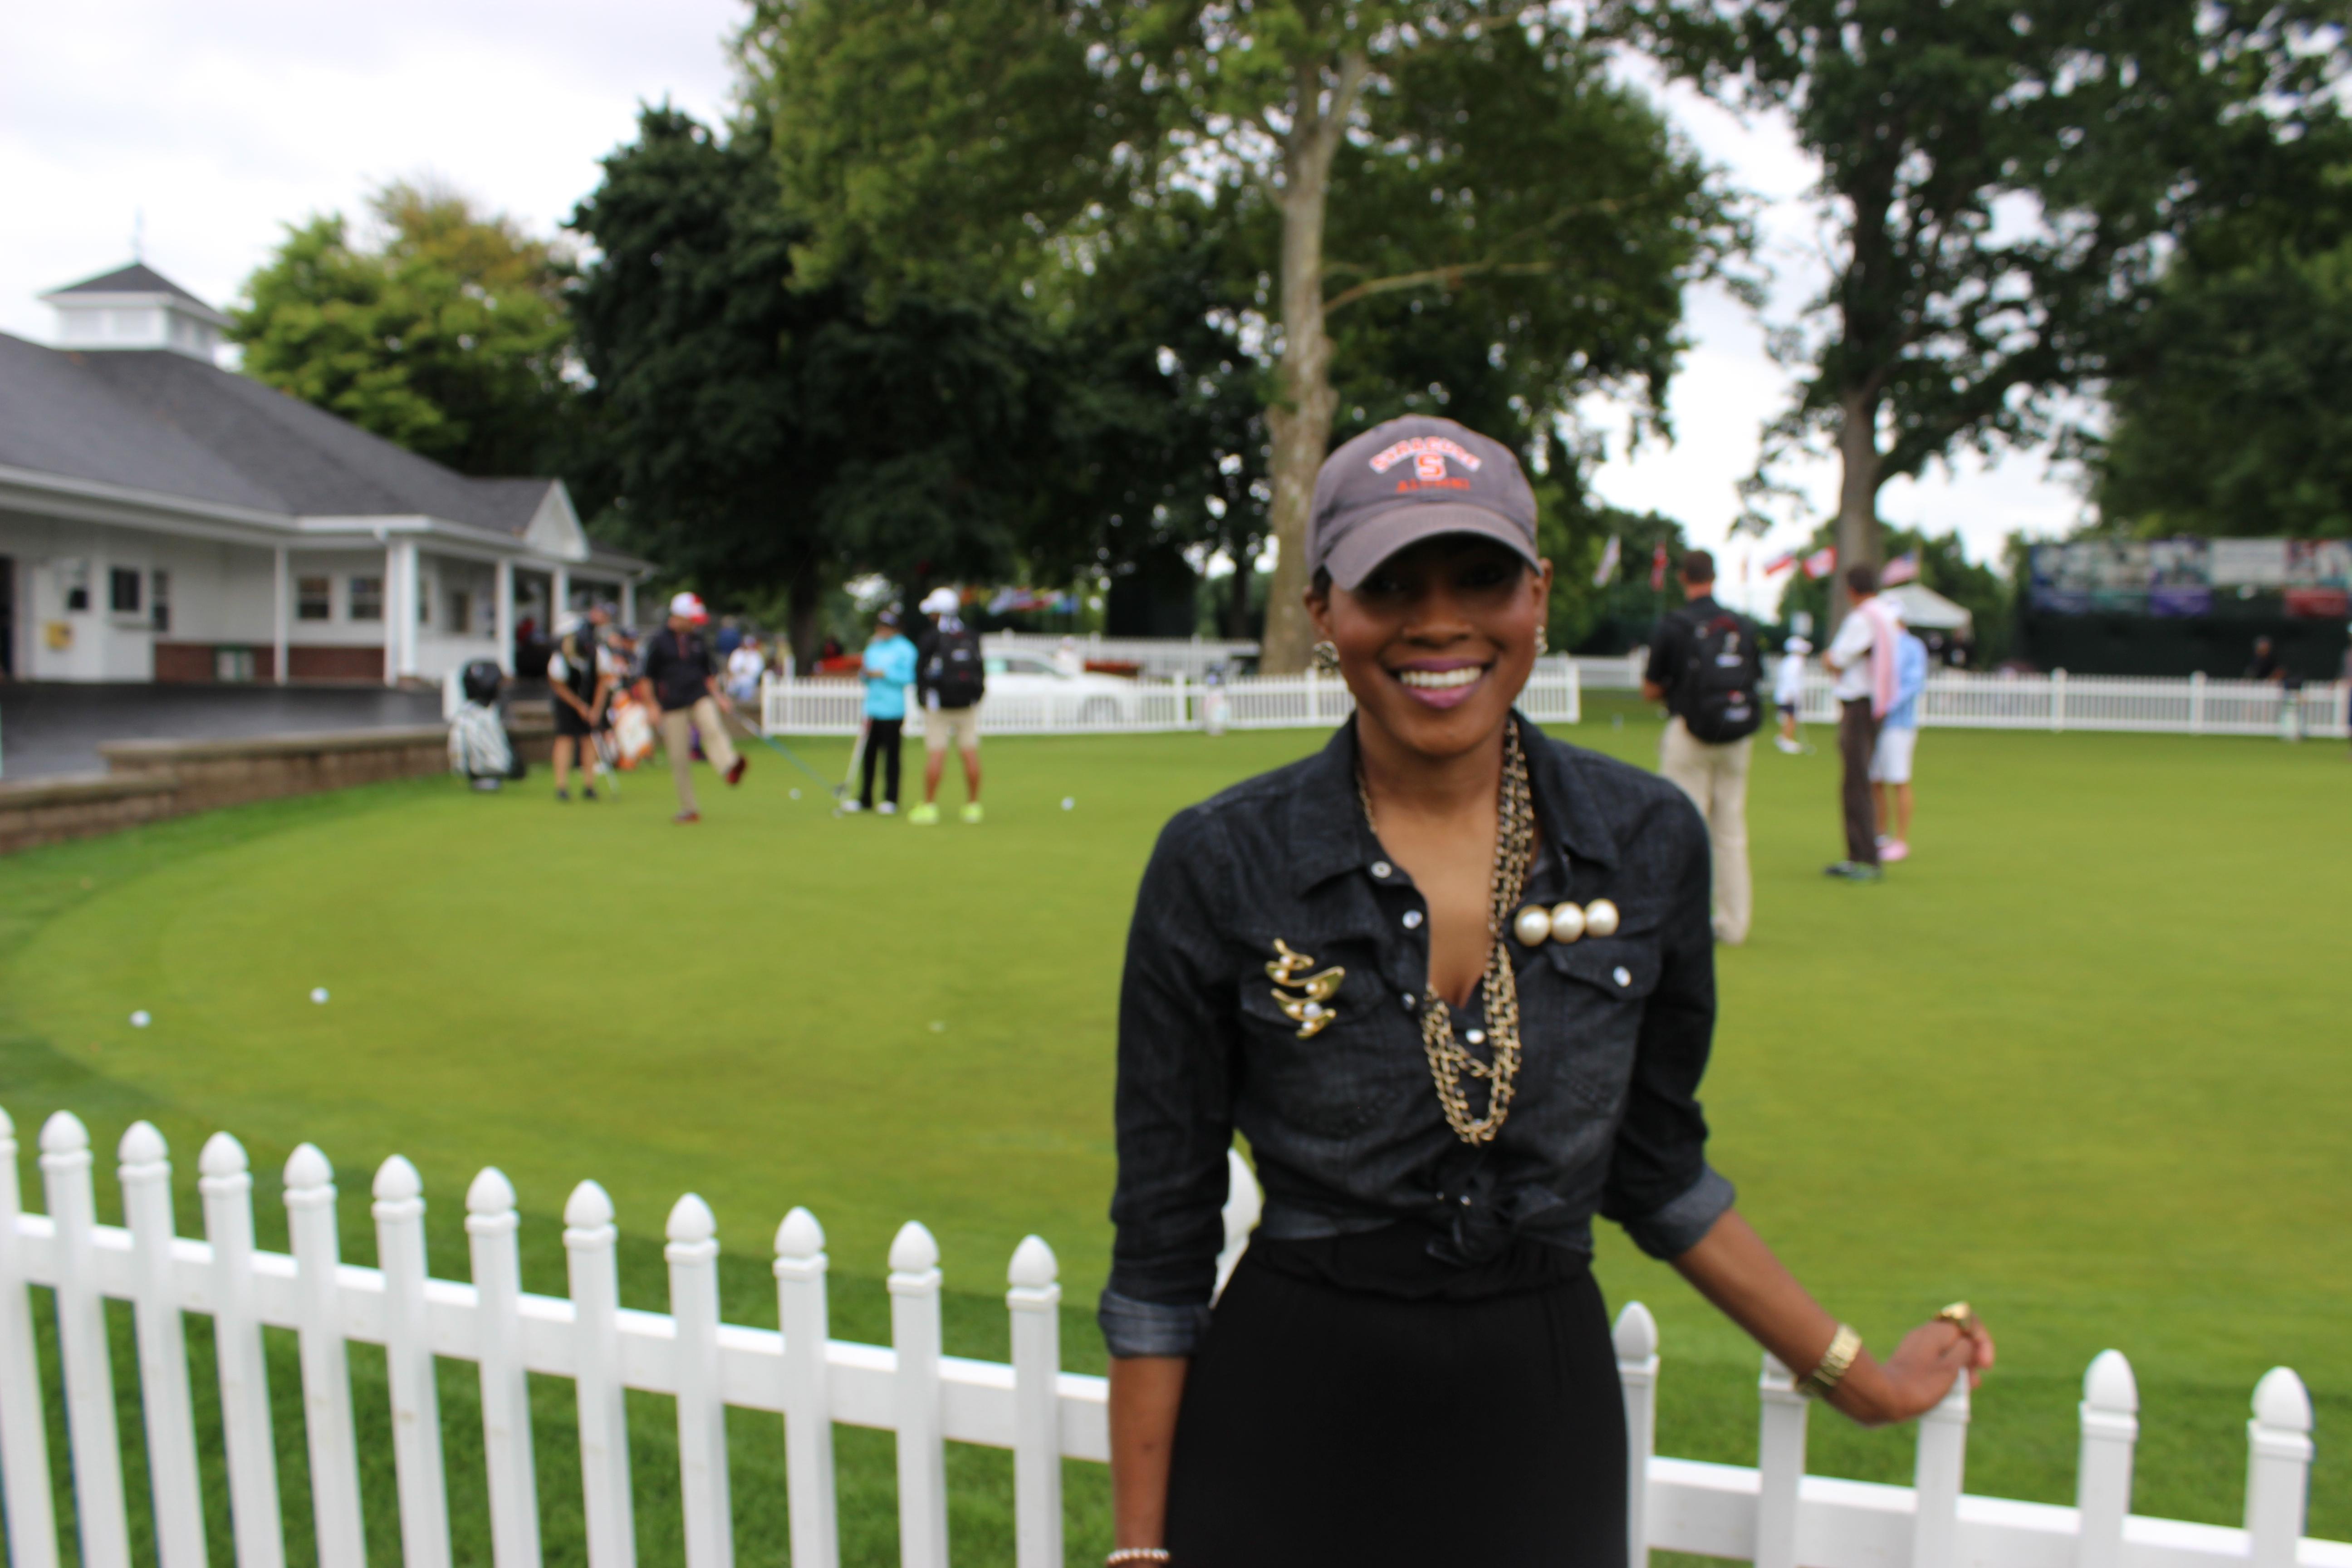 Life-Styles-with-Pretty- Price-Wegmans-LPGA- Championship-Practice-Round-3